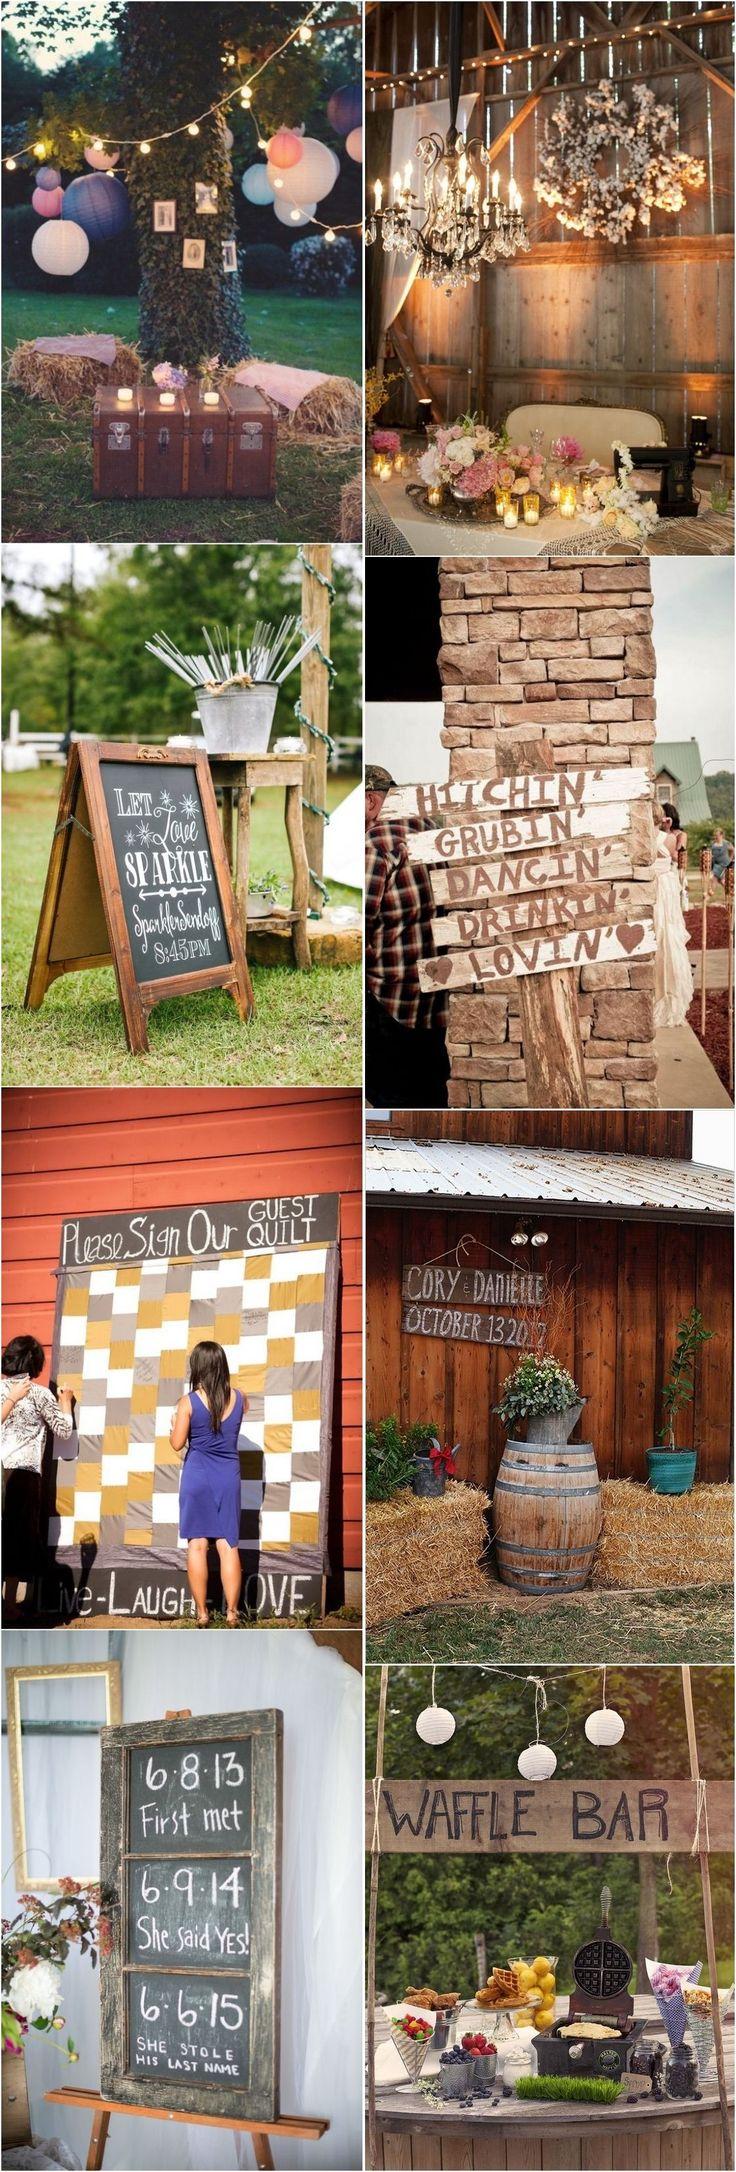 rustic country hay bale wedding decor ideas / http://www.deerpearlflowers.com/country-rustic-wedding-ideas/